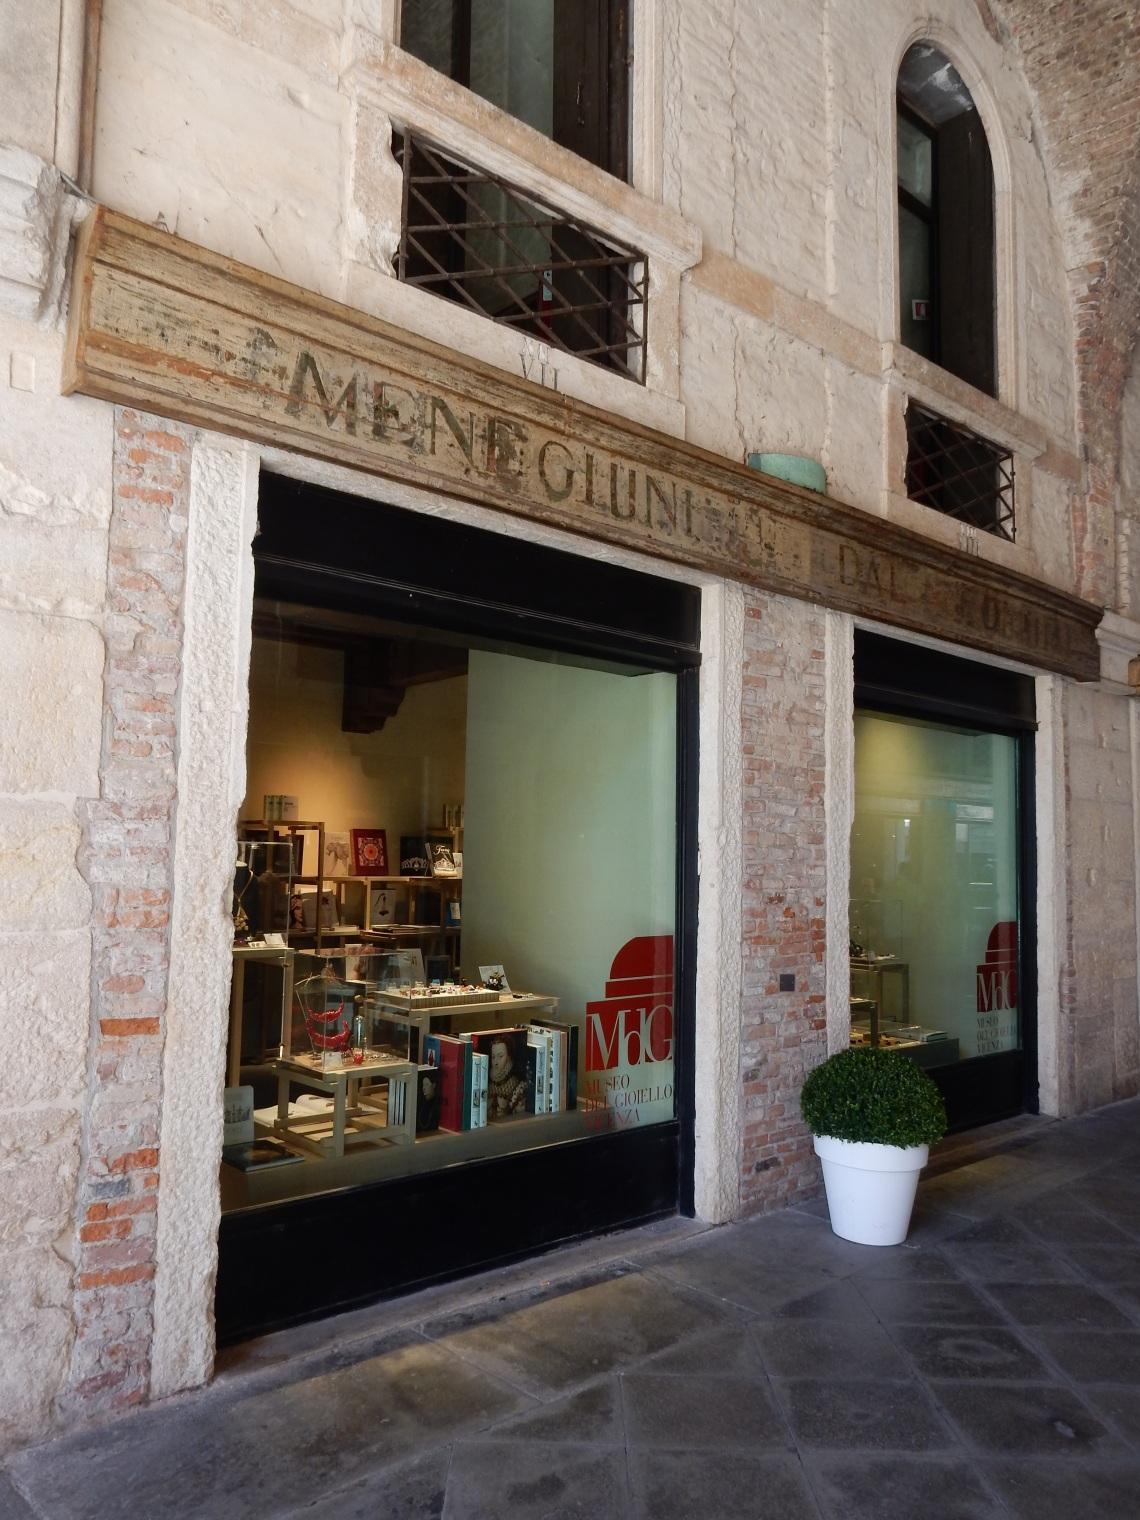 Museo del Gioiello, Vicenza. Foto met dank aan Coert Peter Krabbe, september 2018, CC BY 4.0